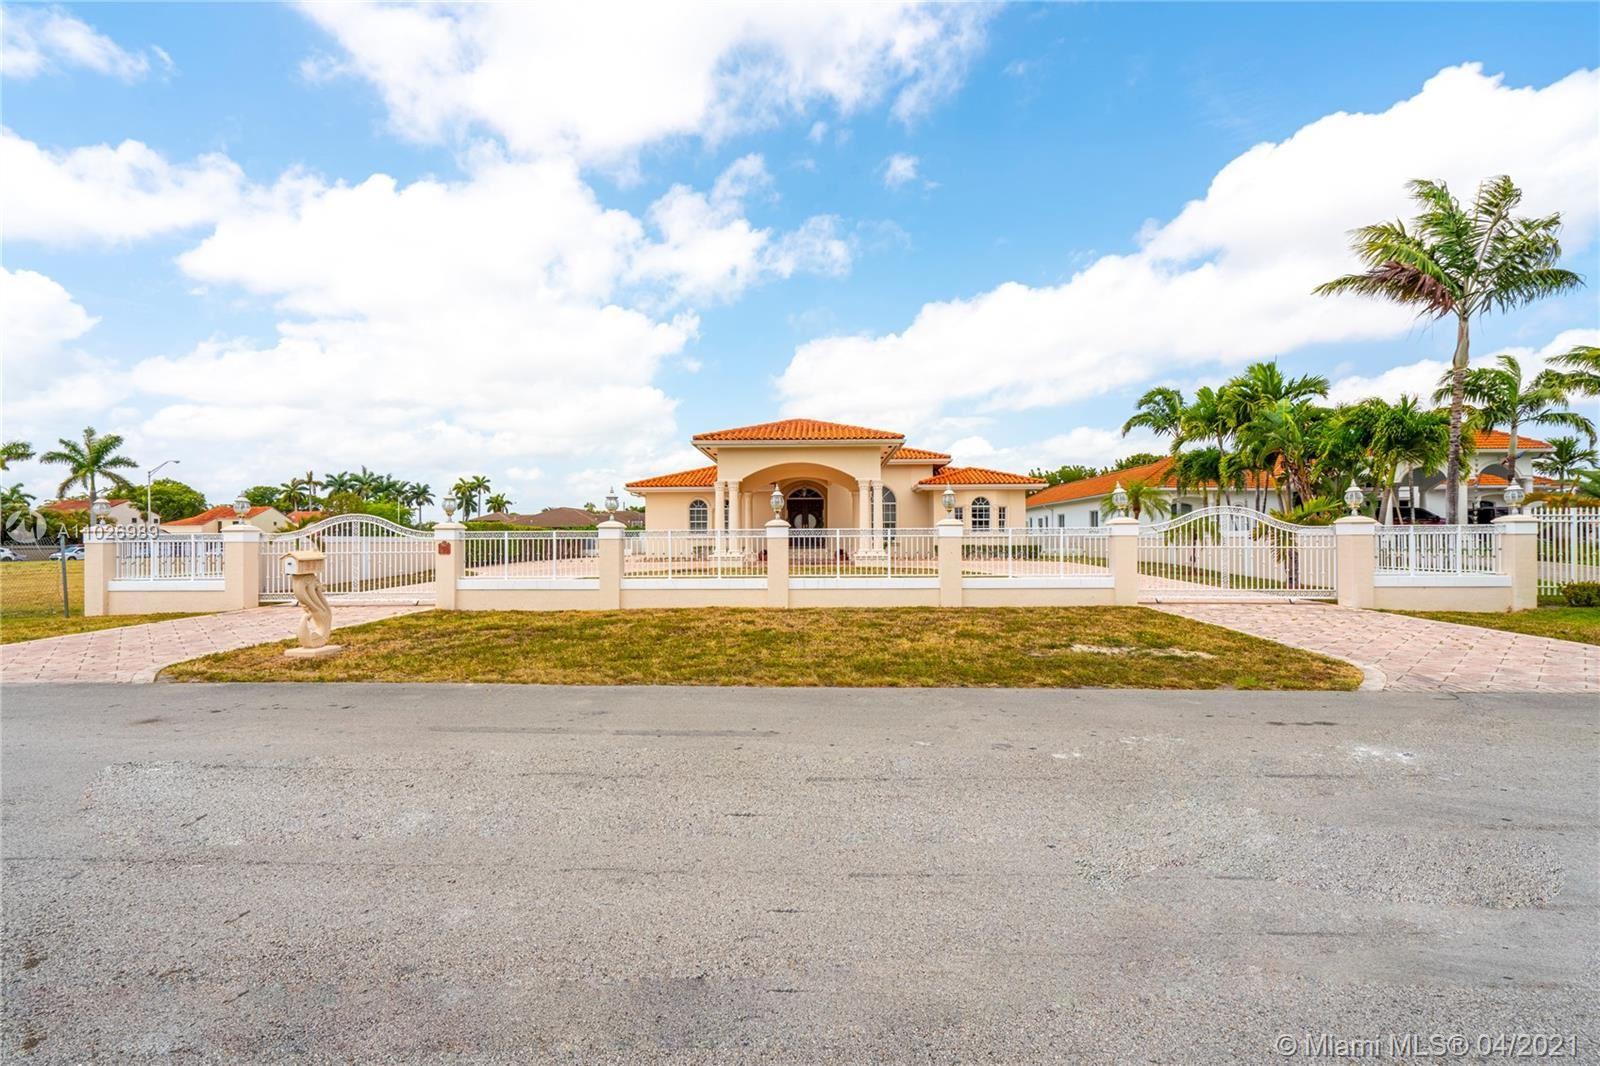 8615 Grand Canal Dr, Miami, FL 33144 - #: A11026989